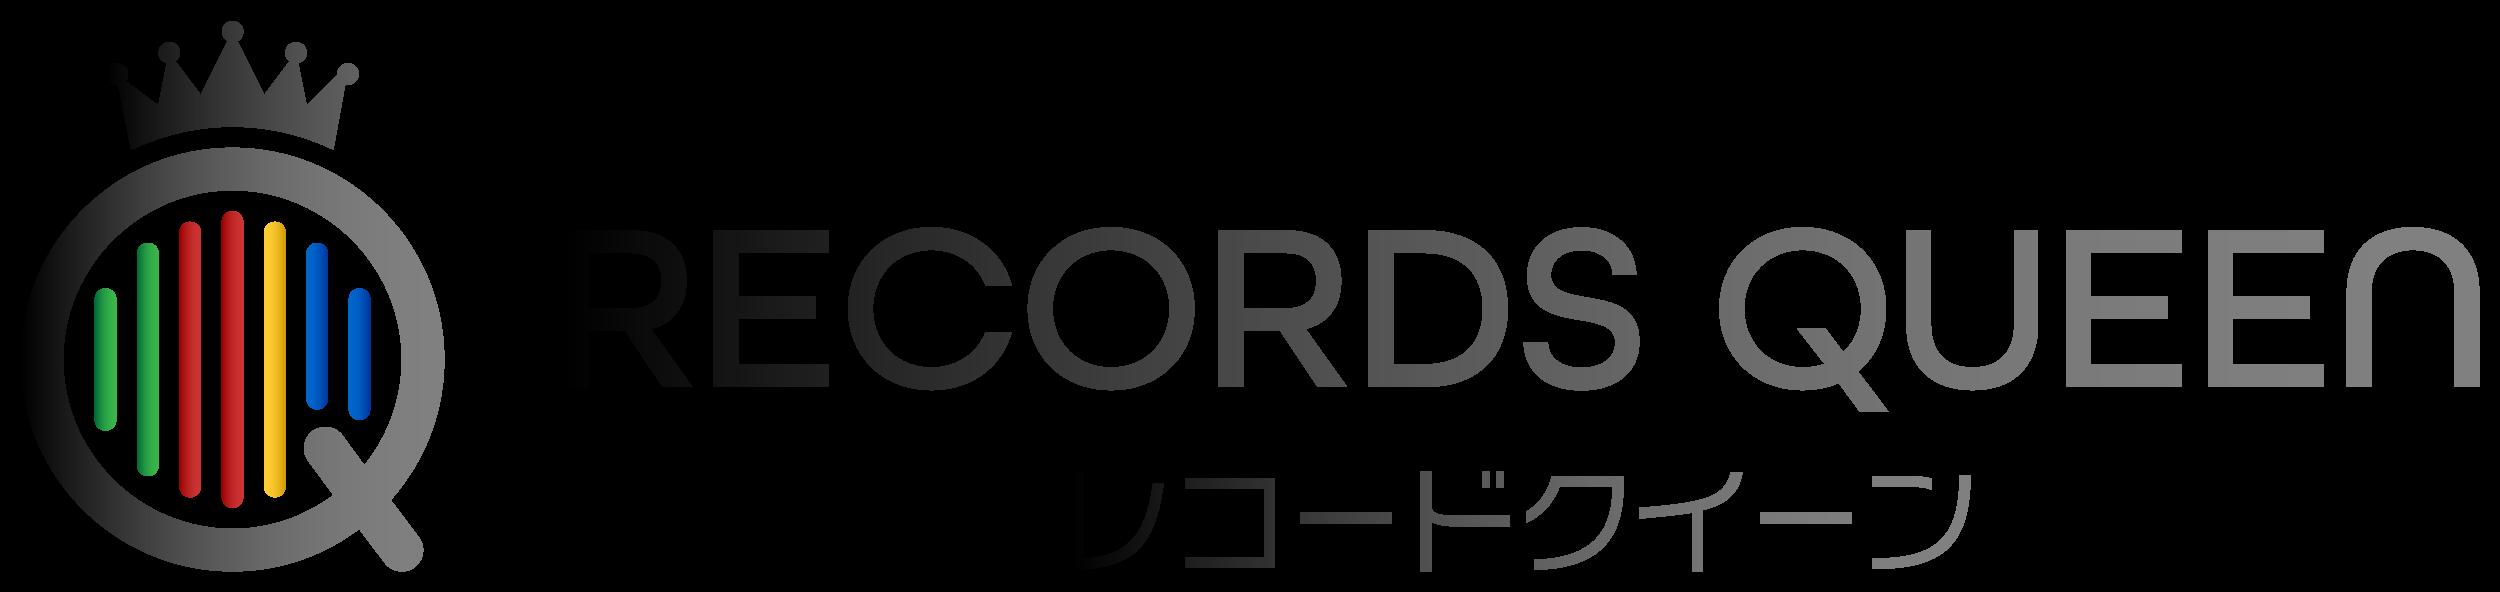 RECORDS QUEEN(レコードクイーン)